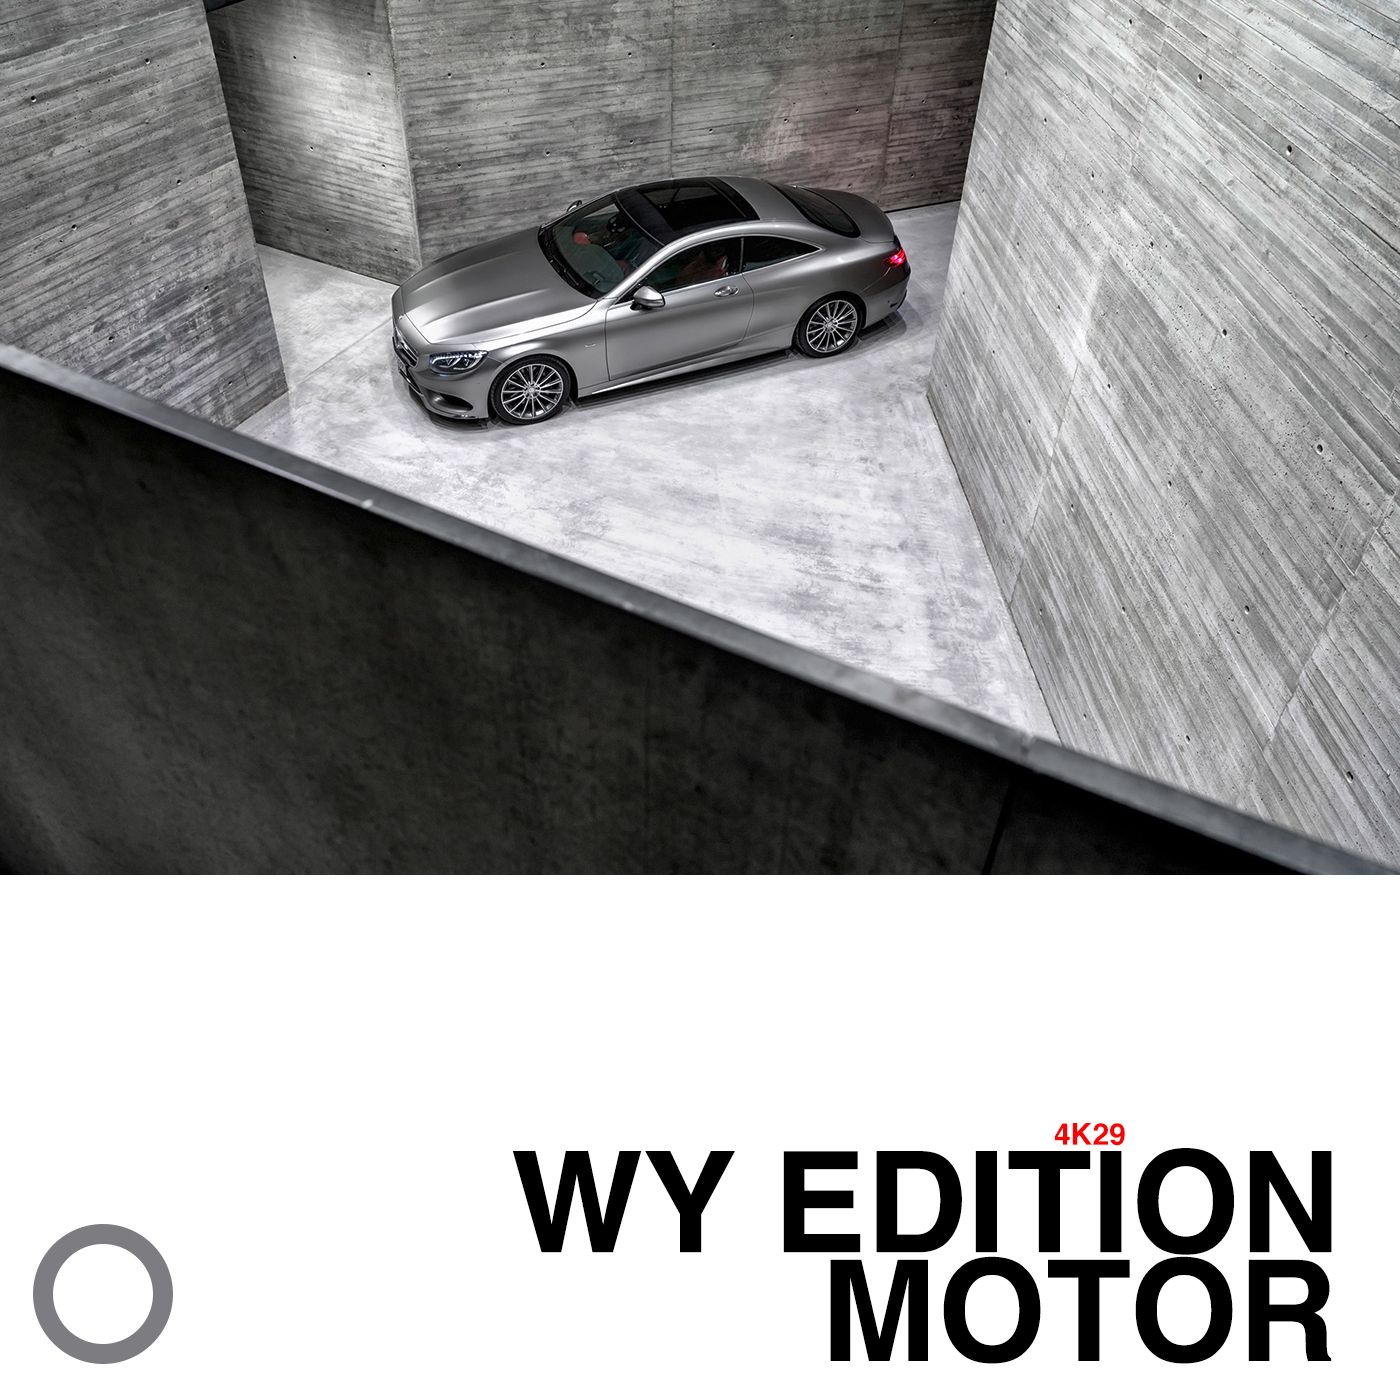 WY EDITION MOTOR 4K29